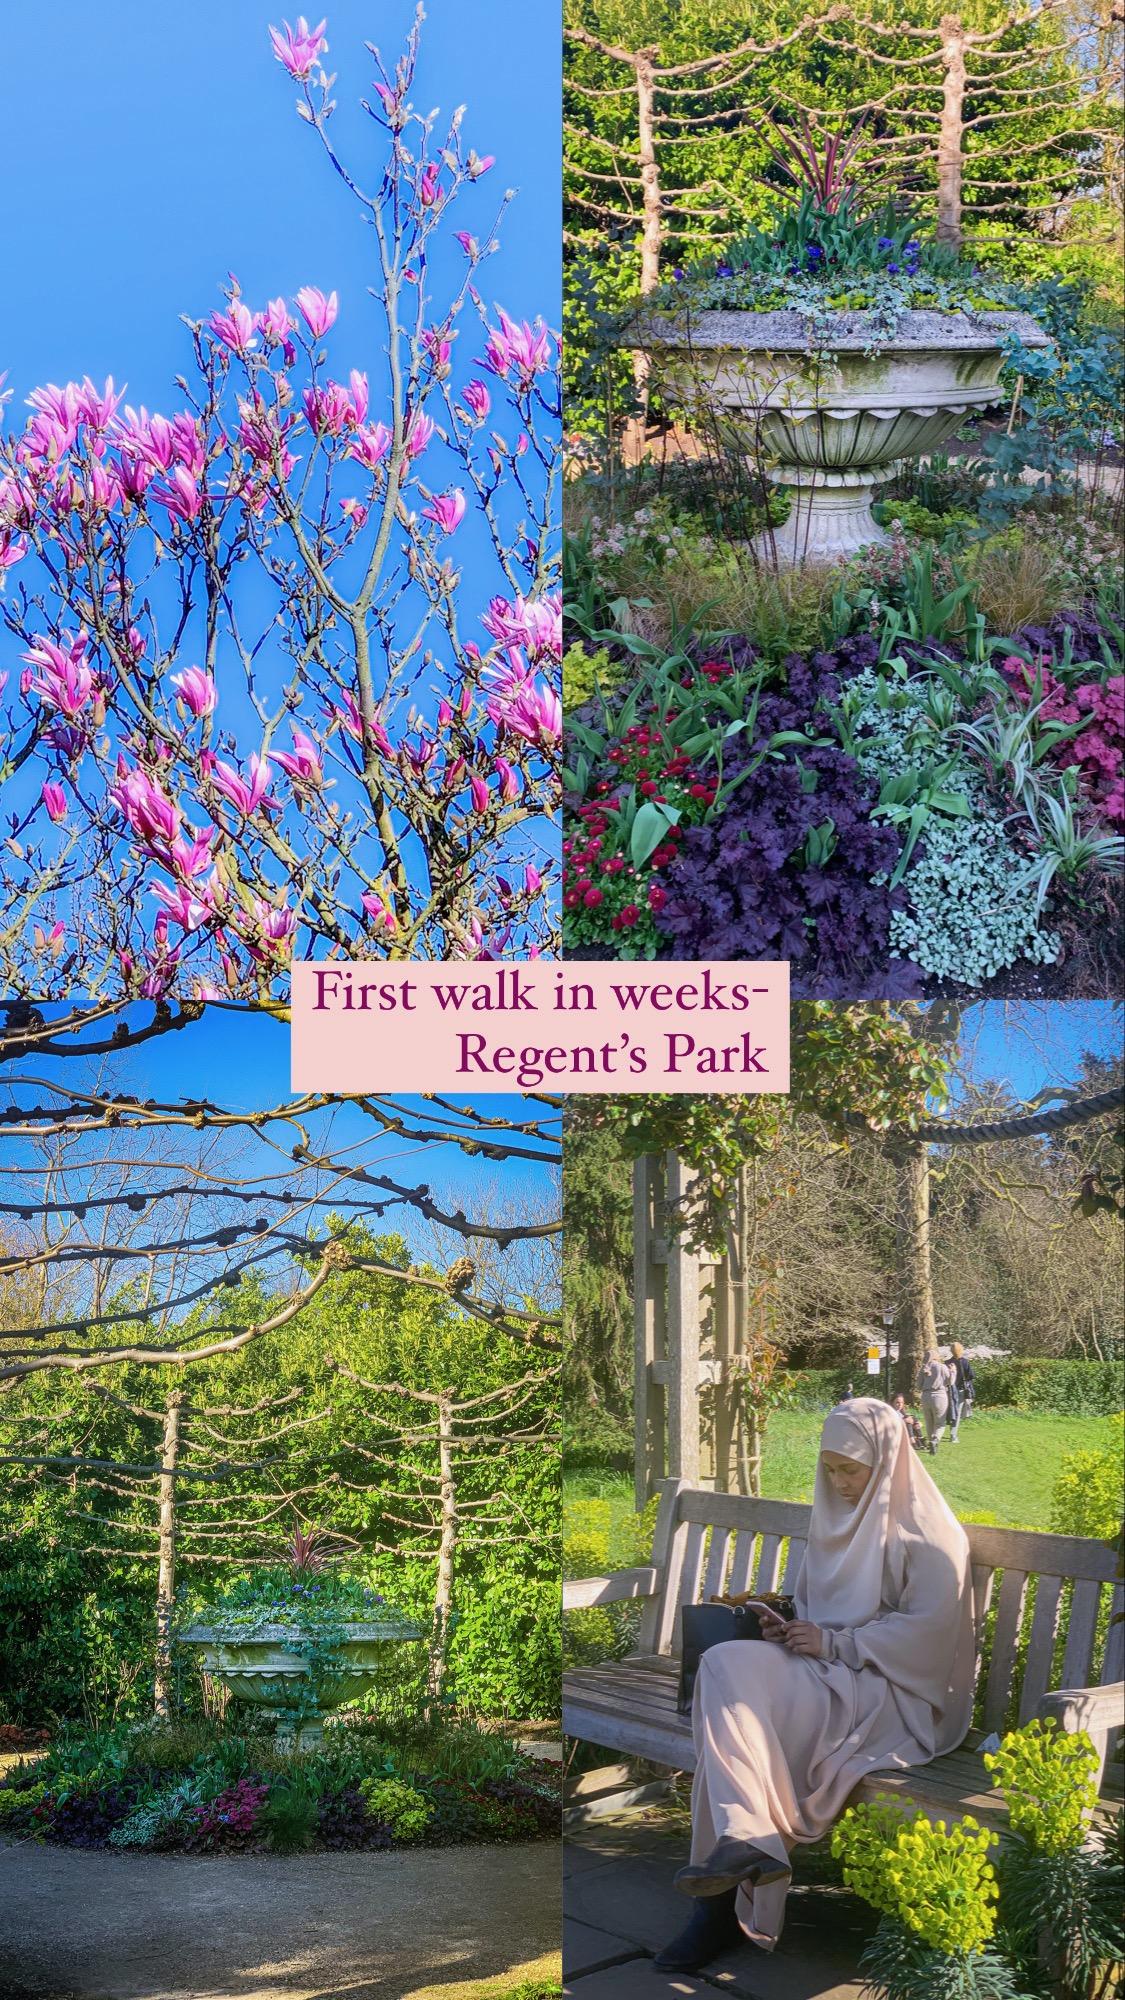 Regents park walk pic:Kerstin Rodgers